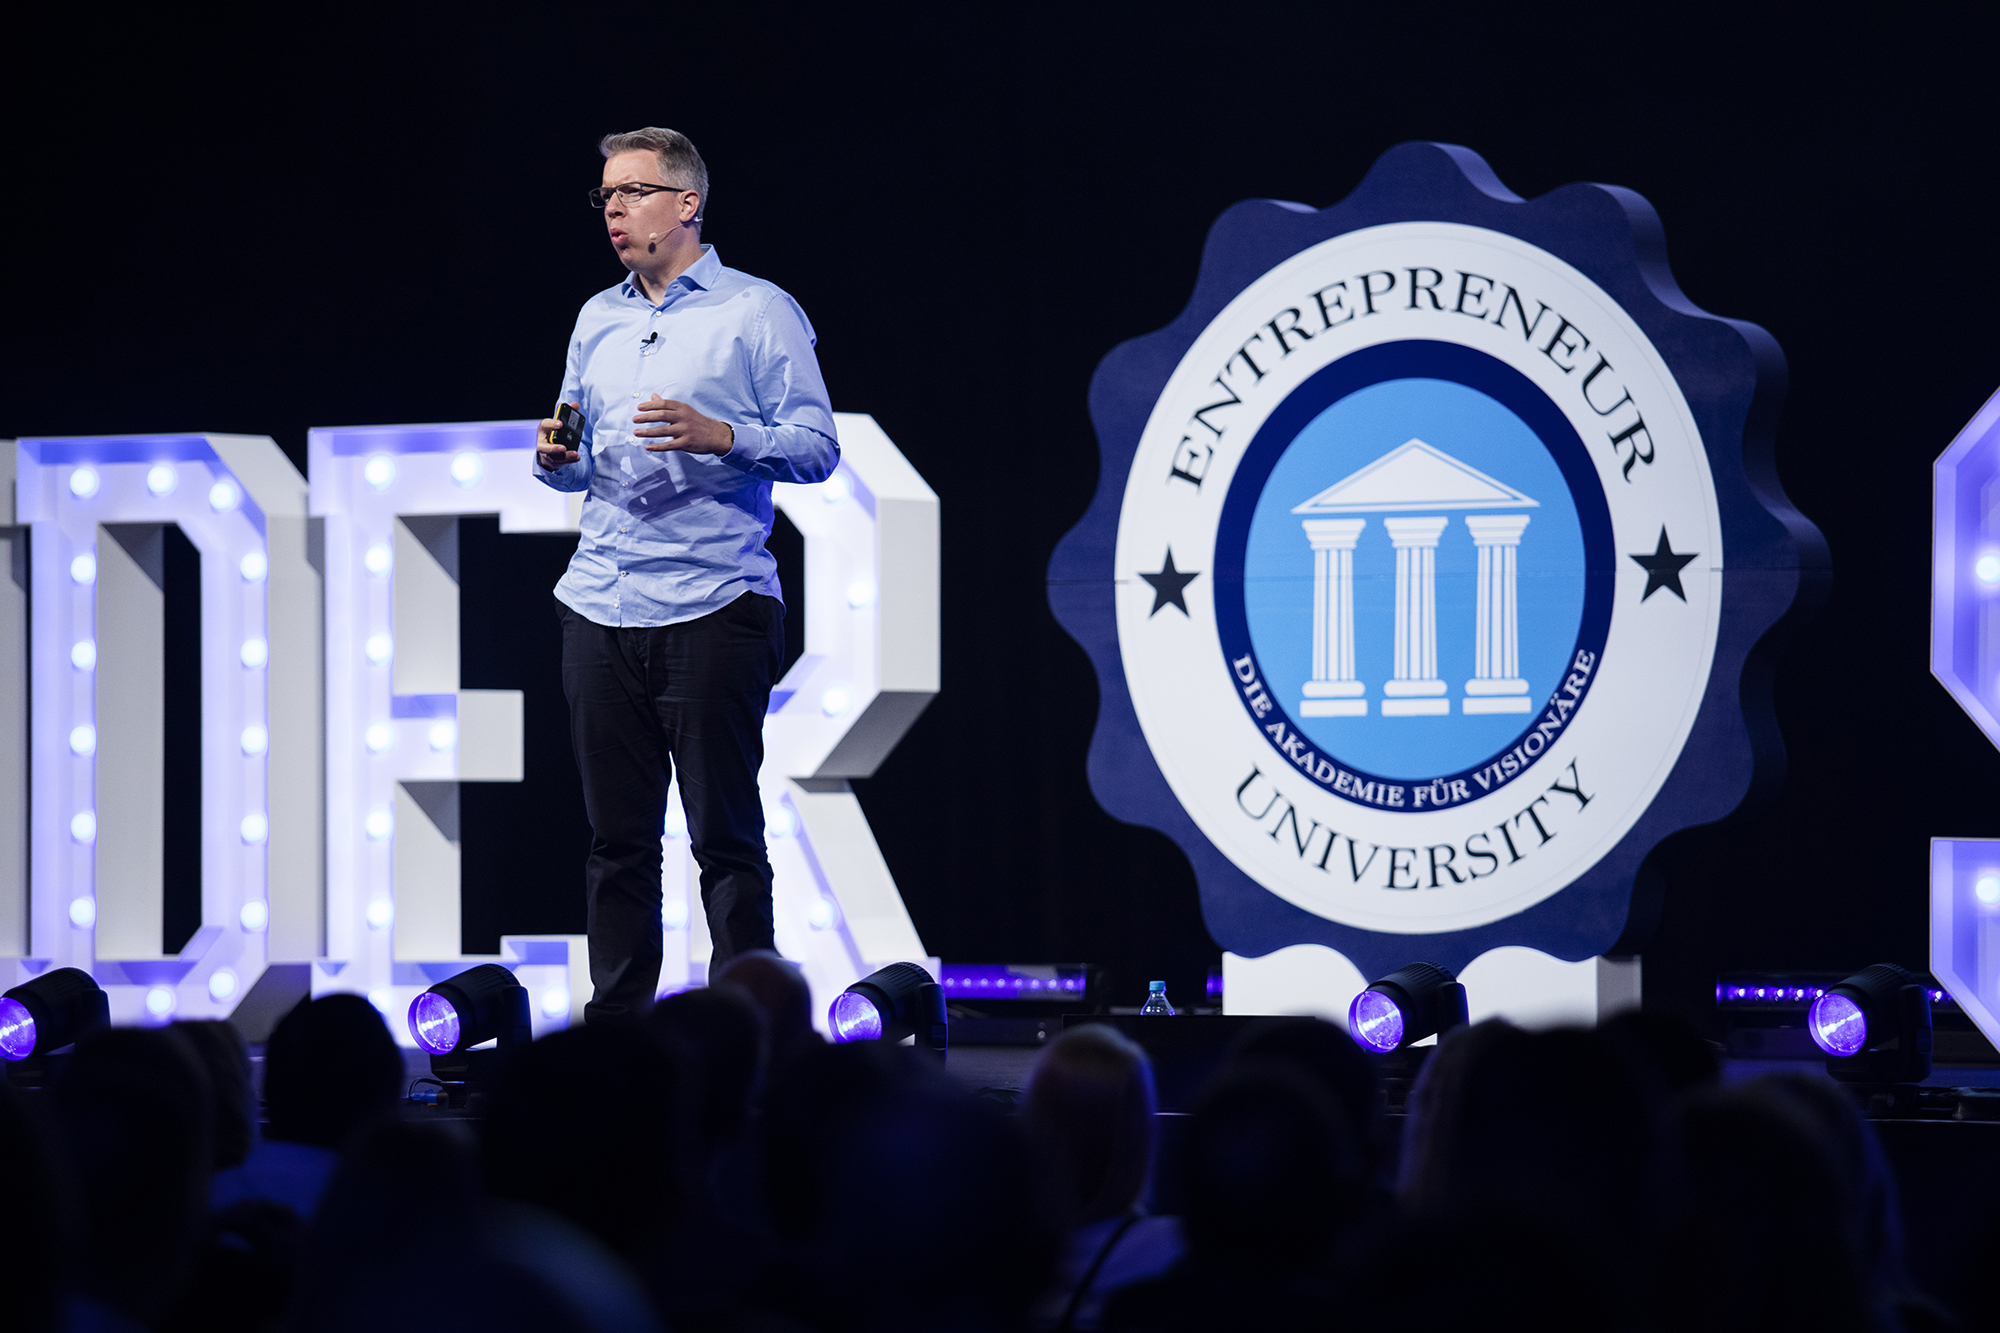 Entrepreneur University Vortrag